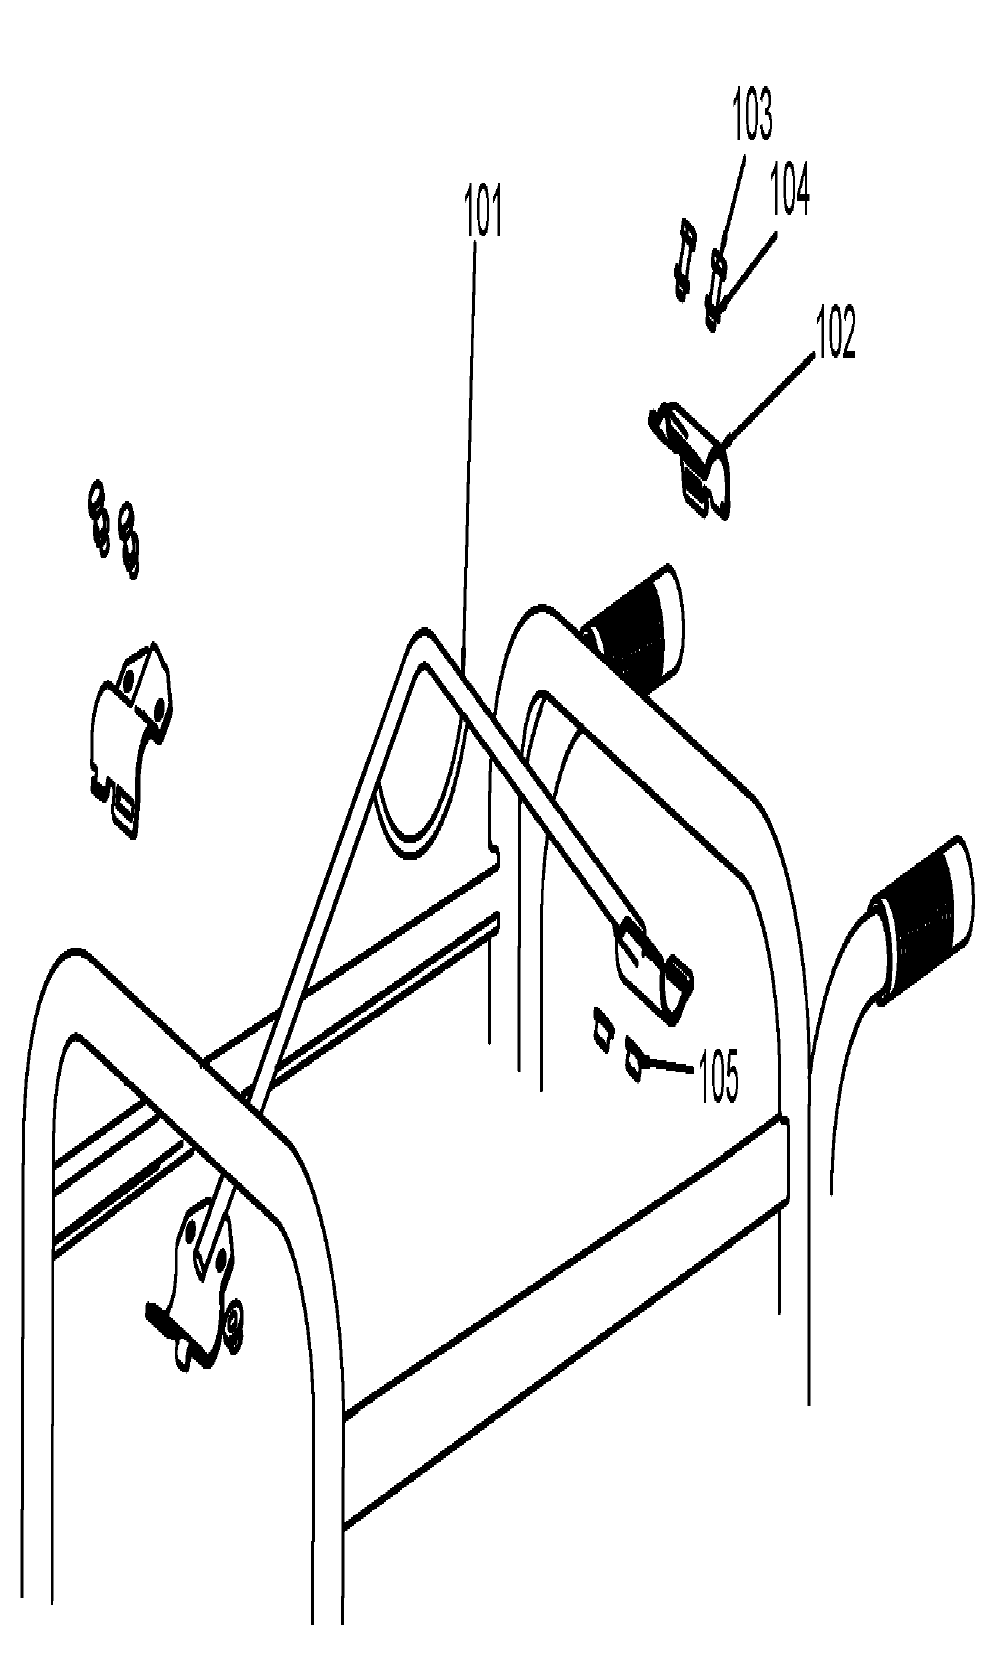 H450IS-W-Portercable-PB-4Break Down